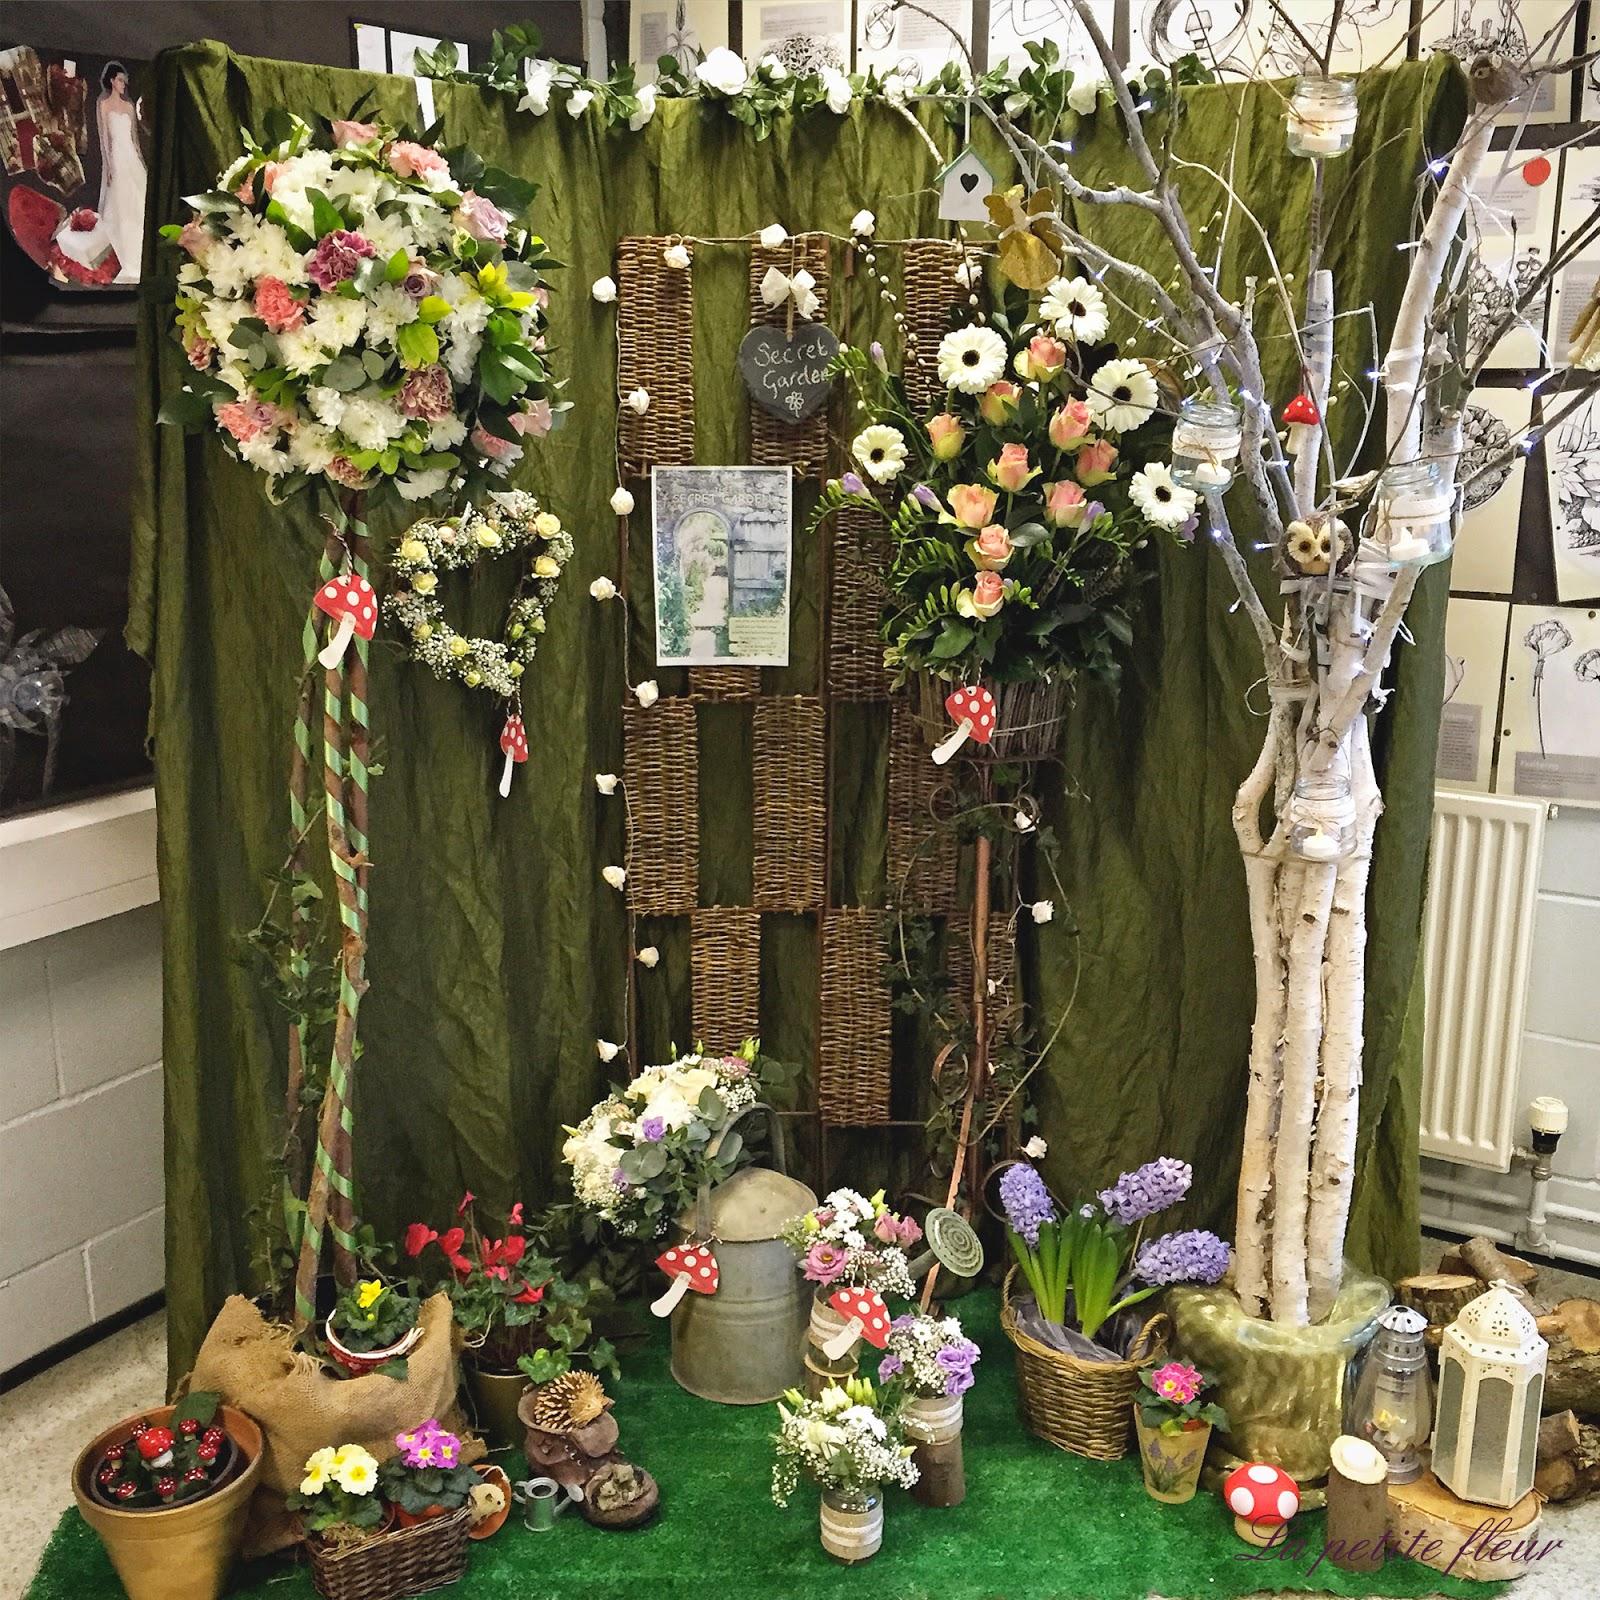 Hannah Louise flowers: The Secret Garden window display